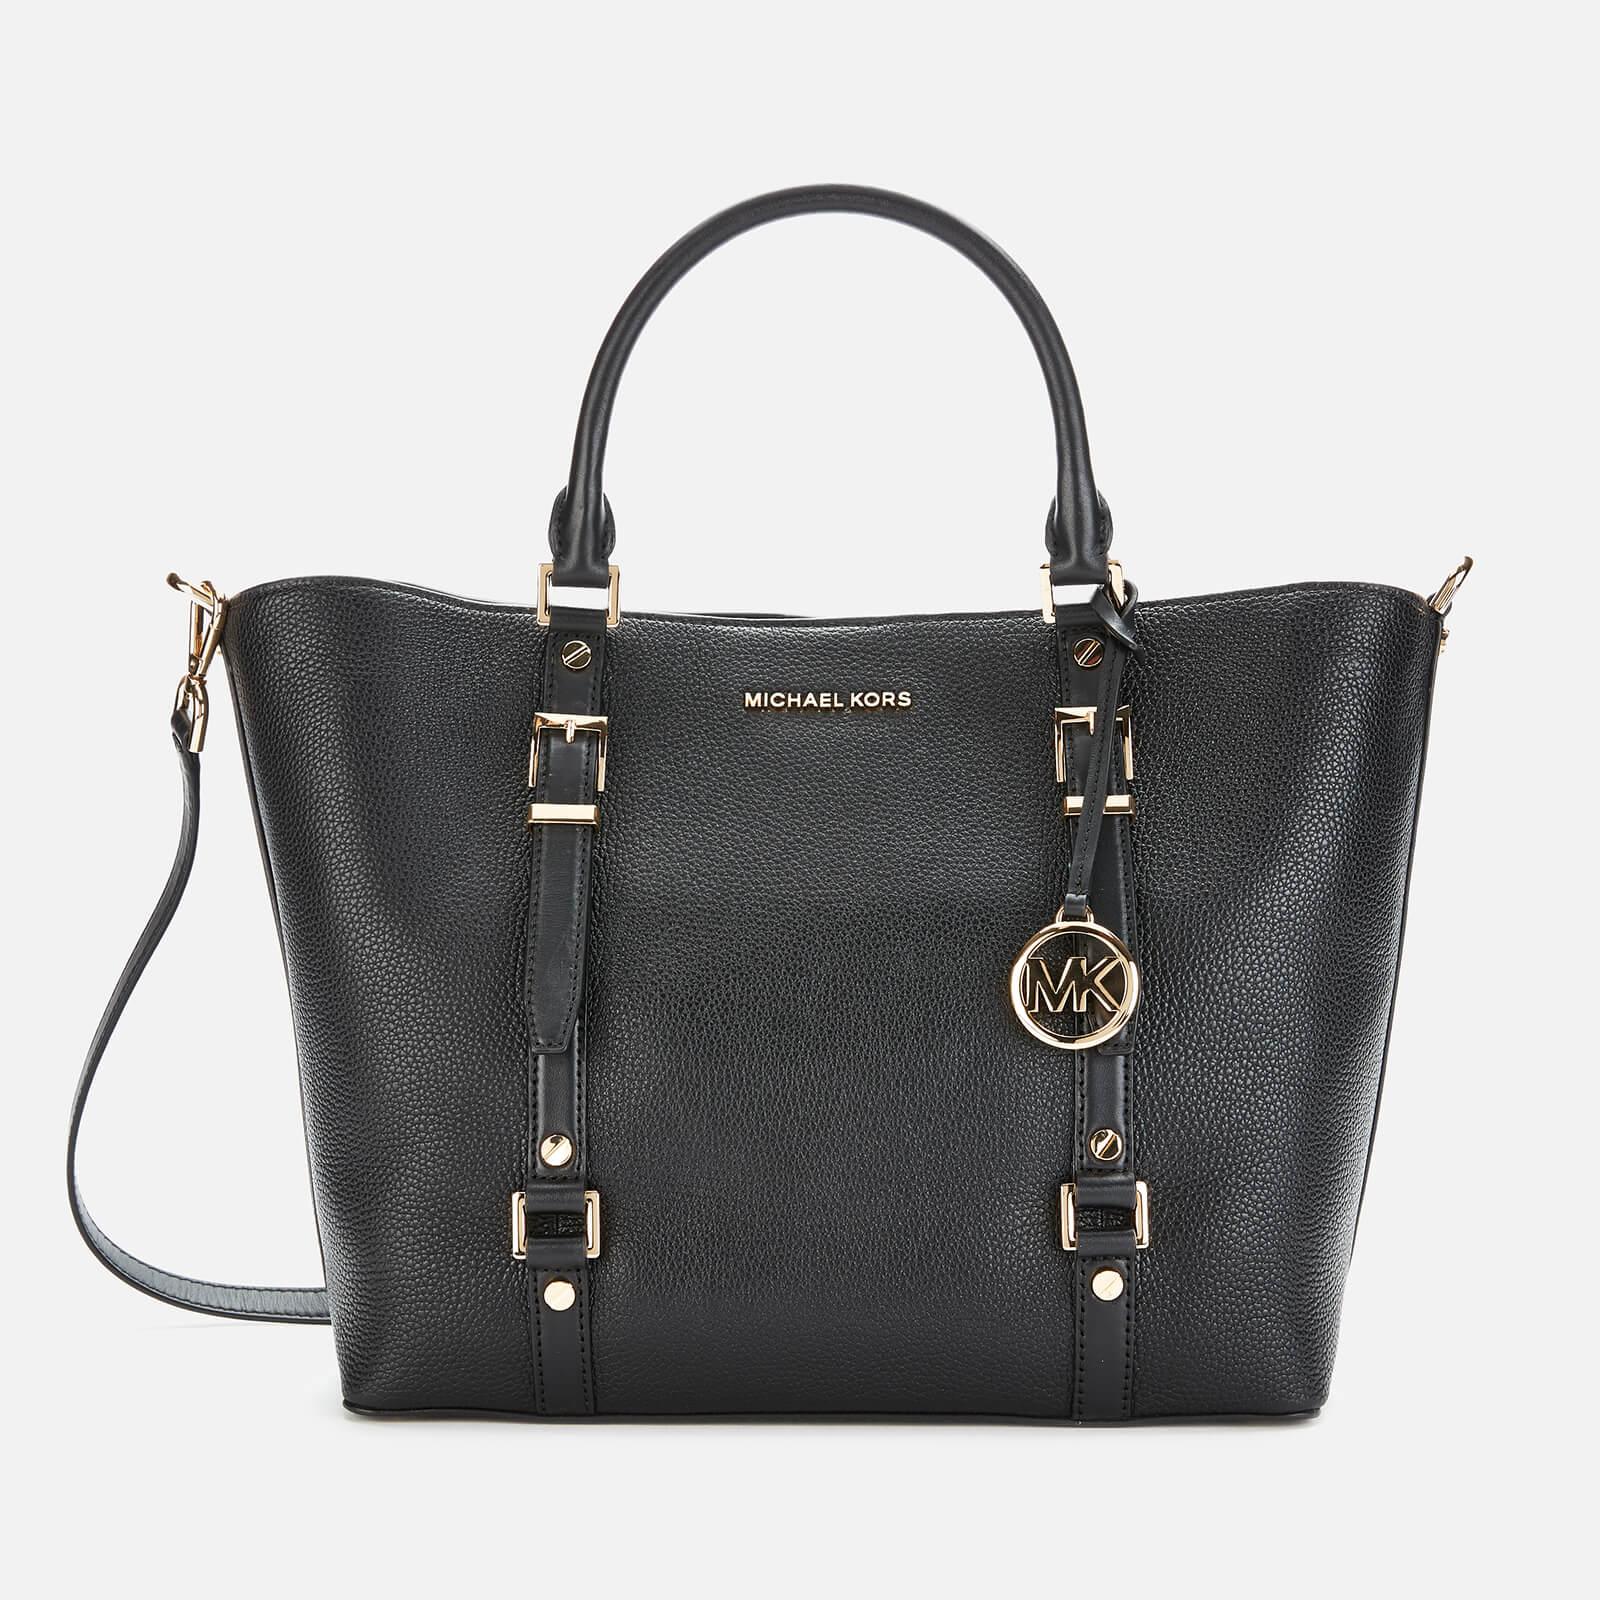 MICHAEL MICHAEL KORS Women's Bedford Legacy Large Grab Tote Bag - Black